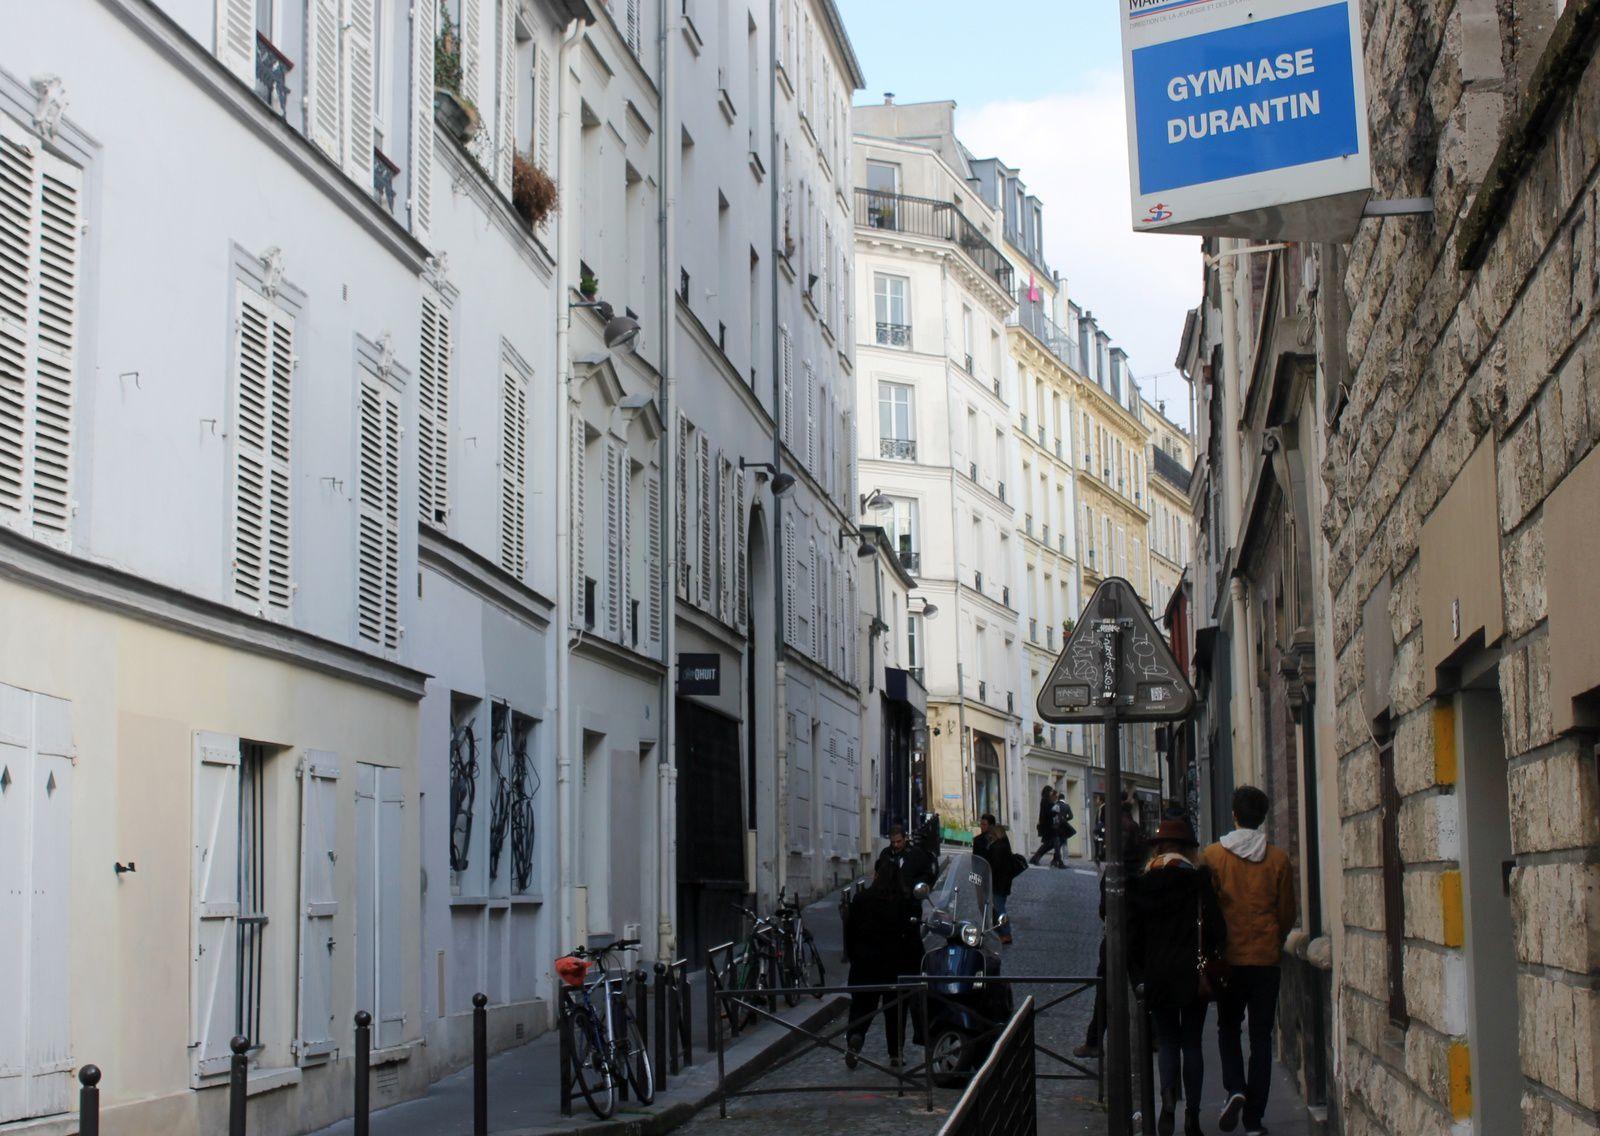 Rue Durantin. Montmartre.